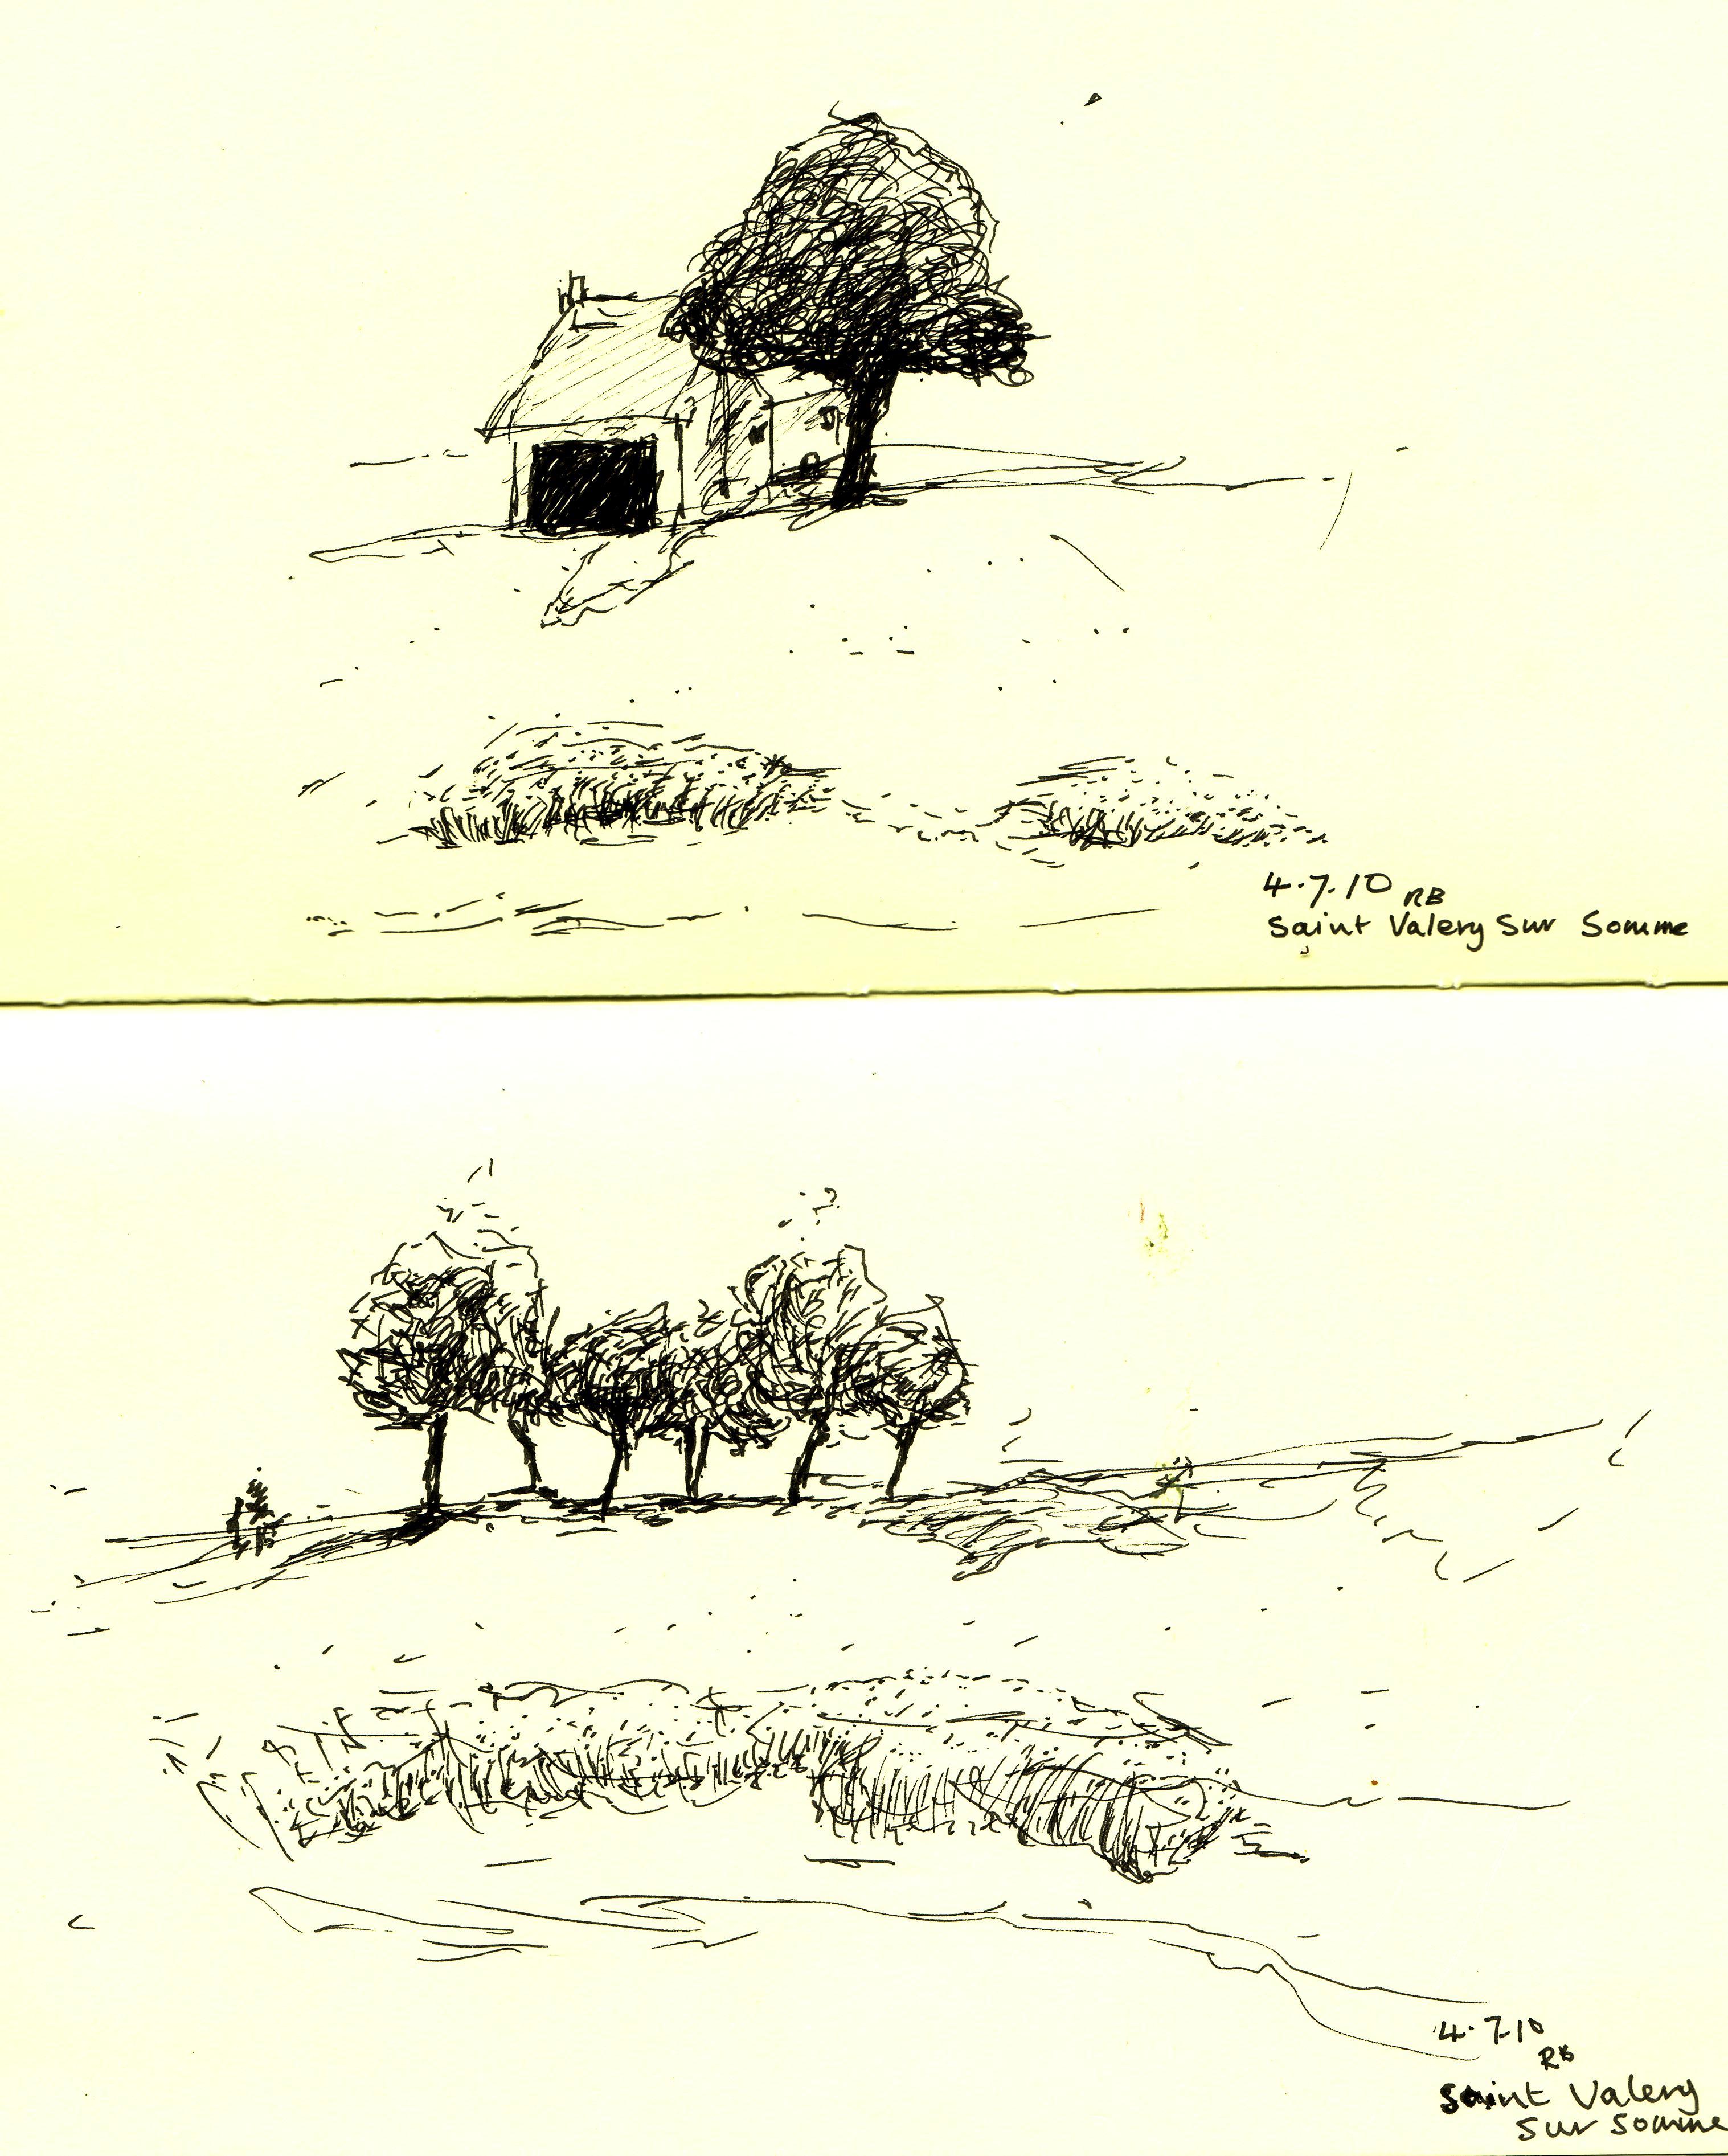 Baie de Somme, two river scenes.